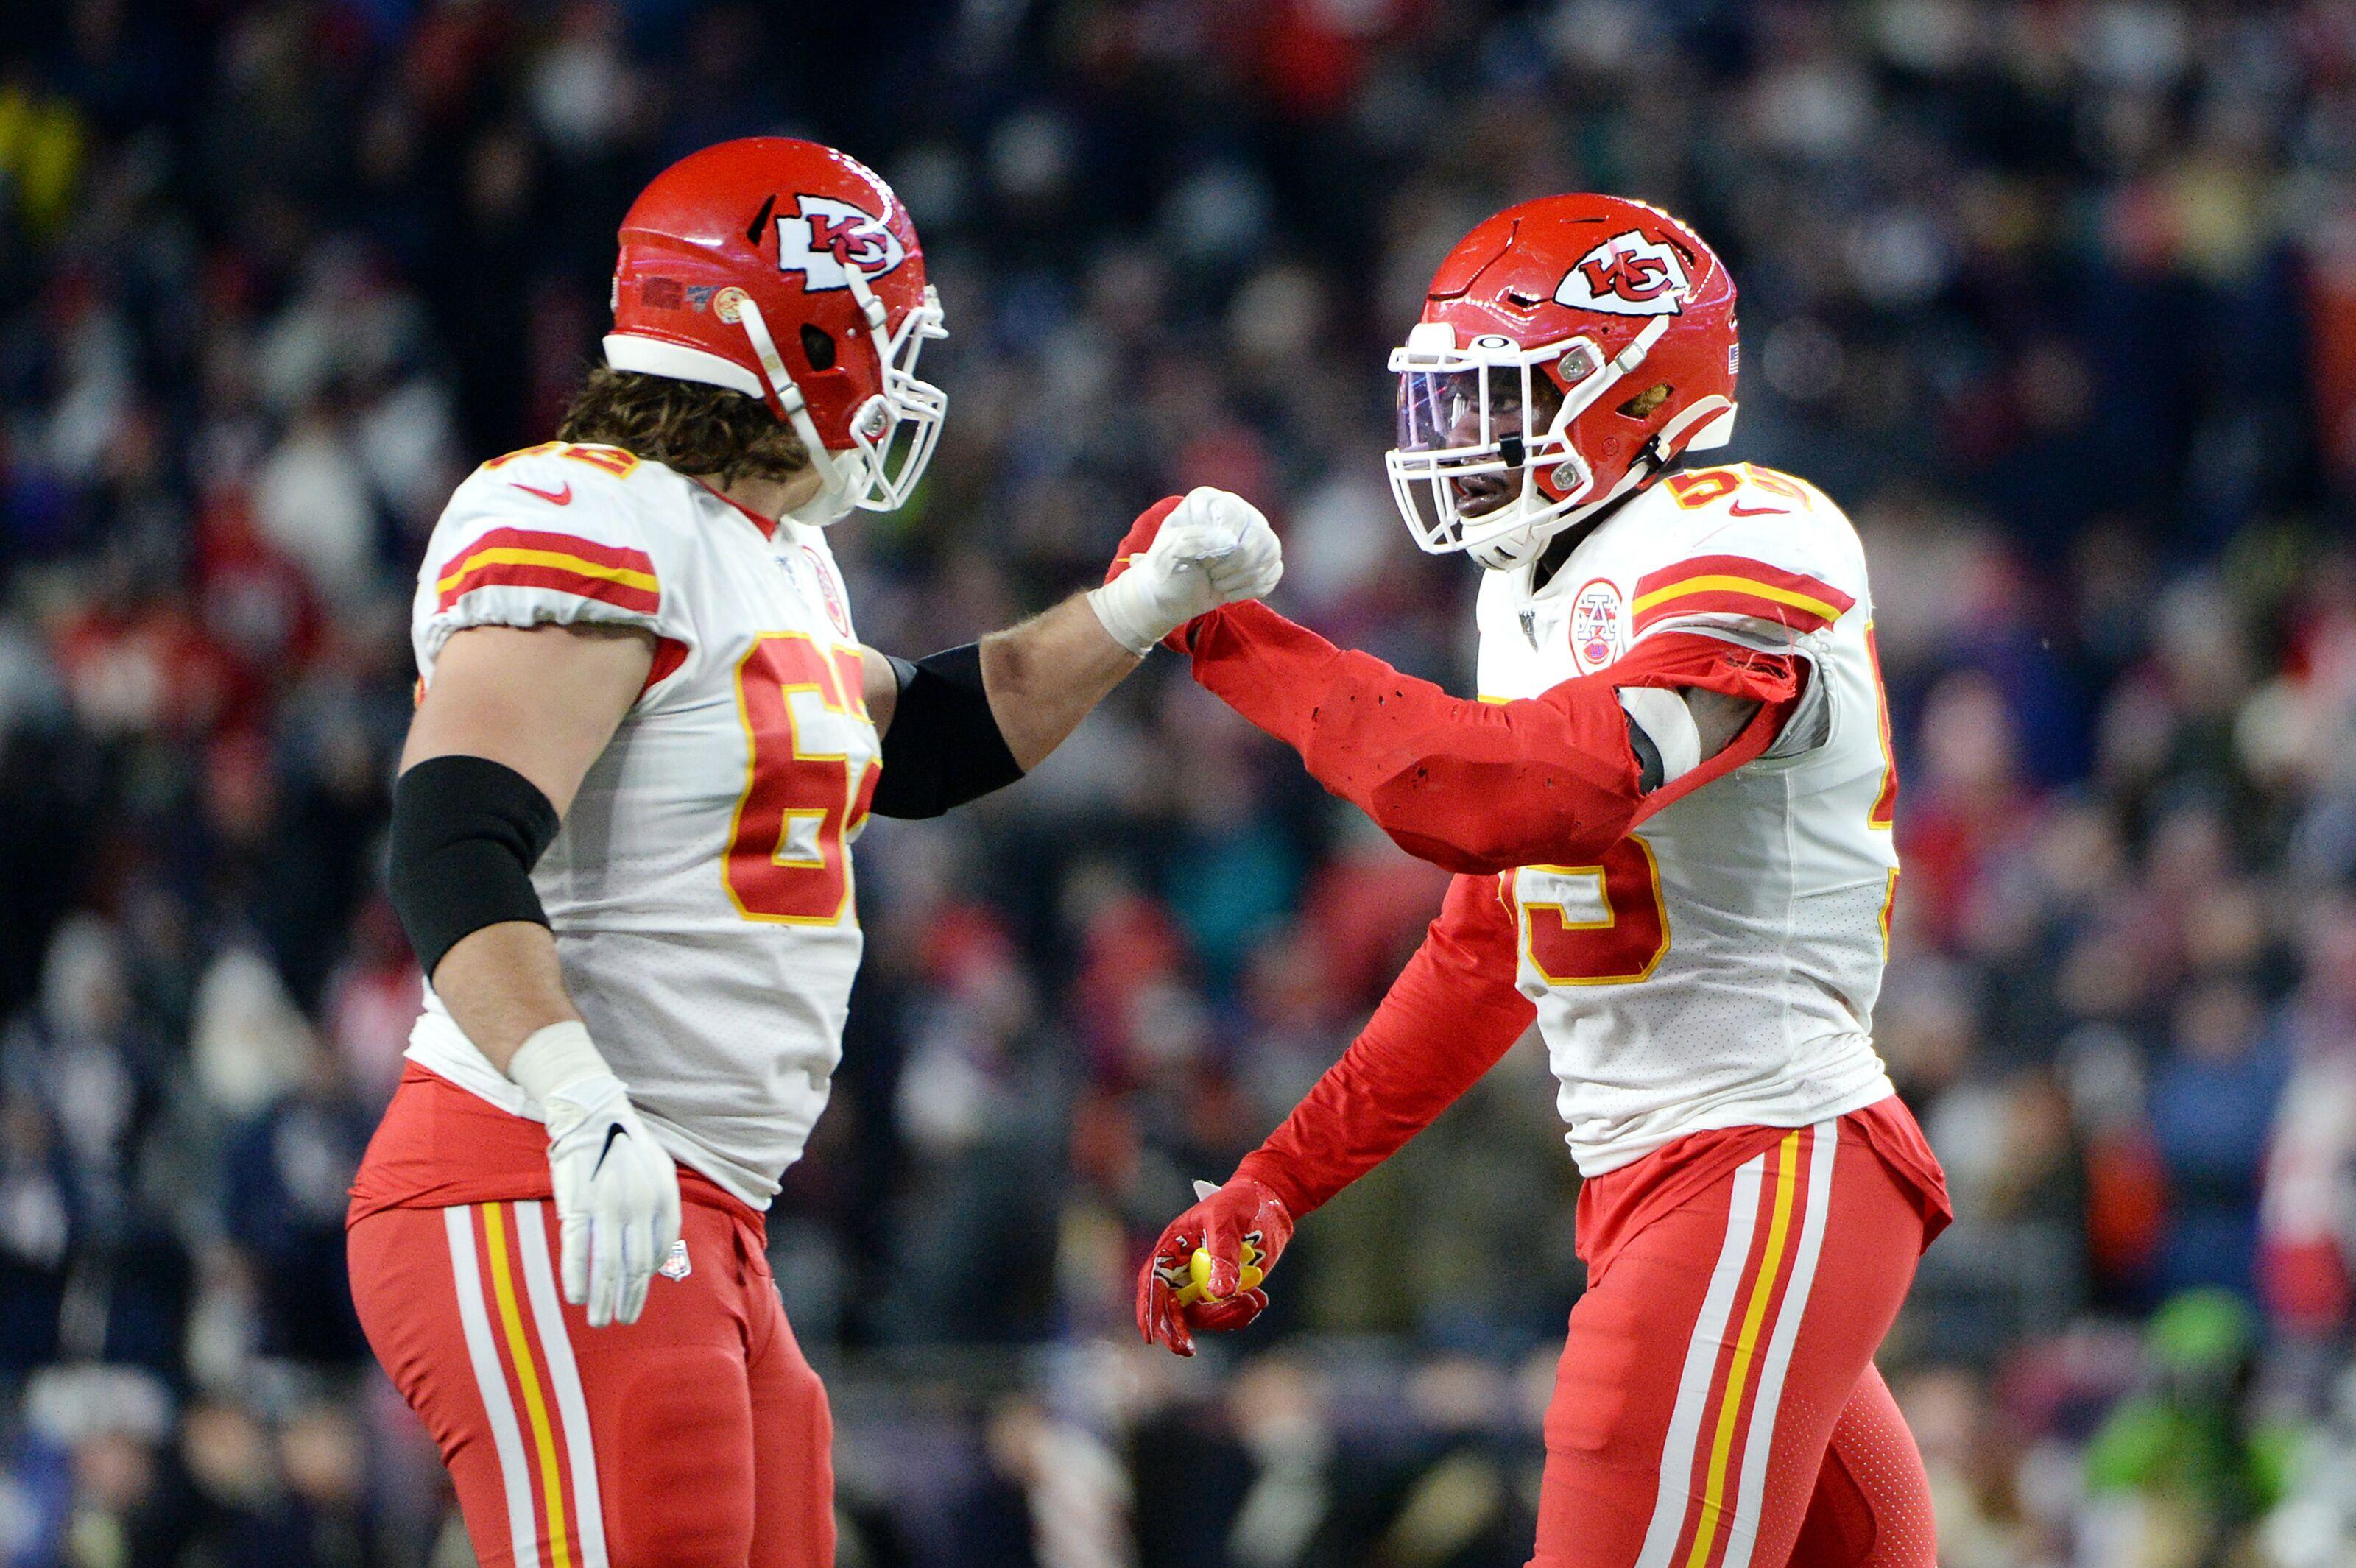 Kansas City Chiefs: Fans shouldn't drink Super Bowl Kool-Aid just yet